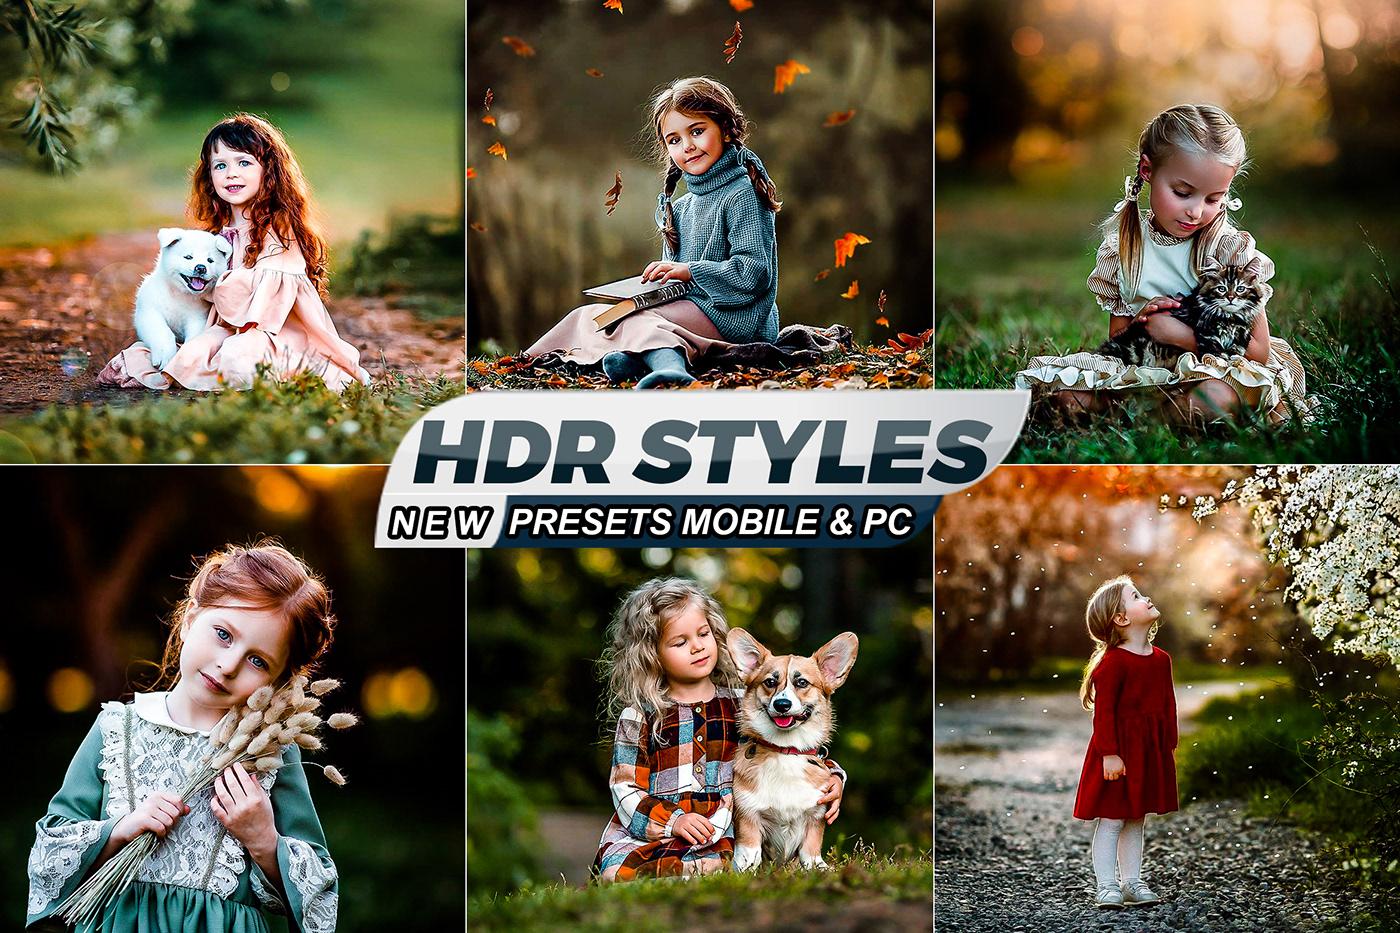 HDR HDR Fashion hdr lifrstyles hdr portrait HDR presets lghtroom preset Preset Preset mobile presets